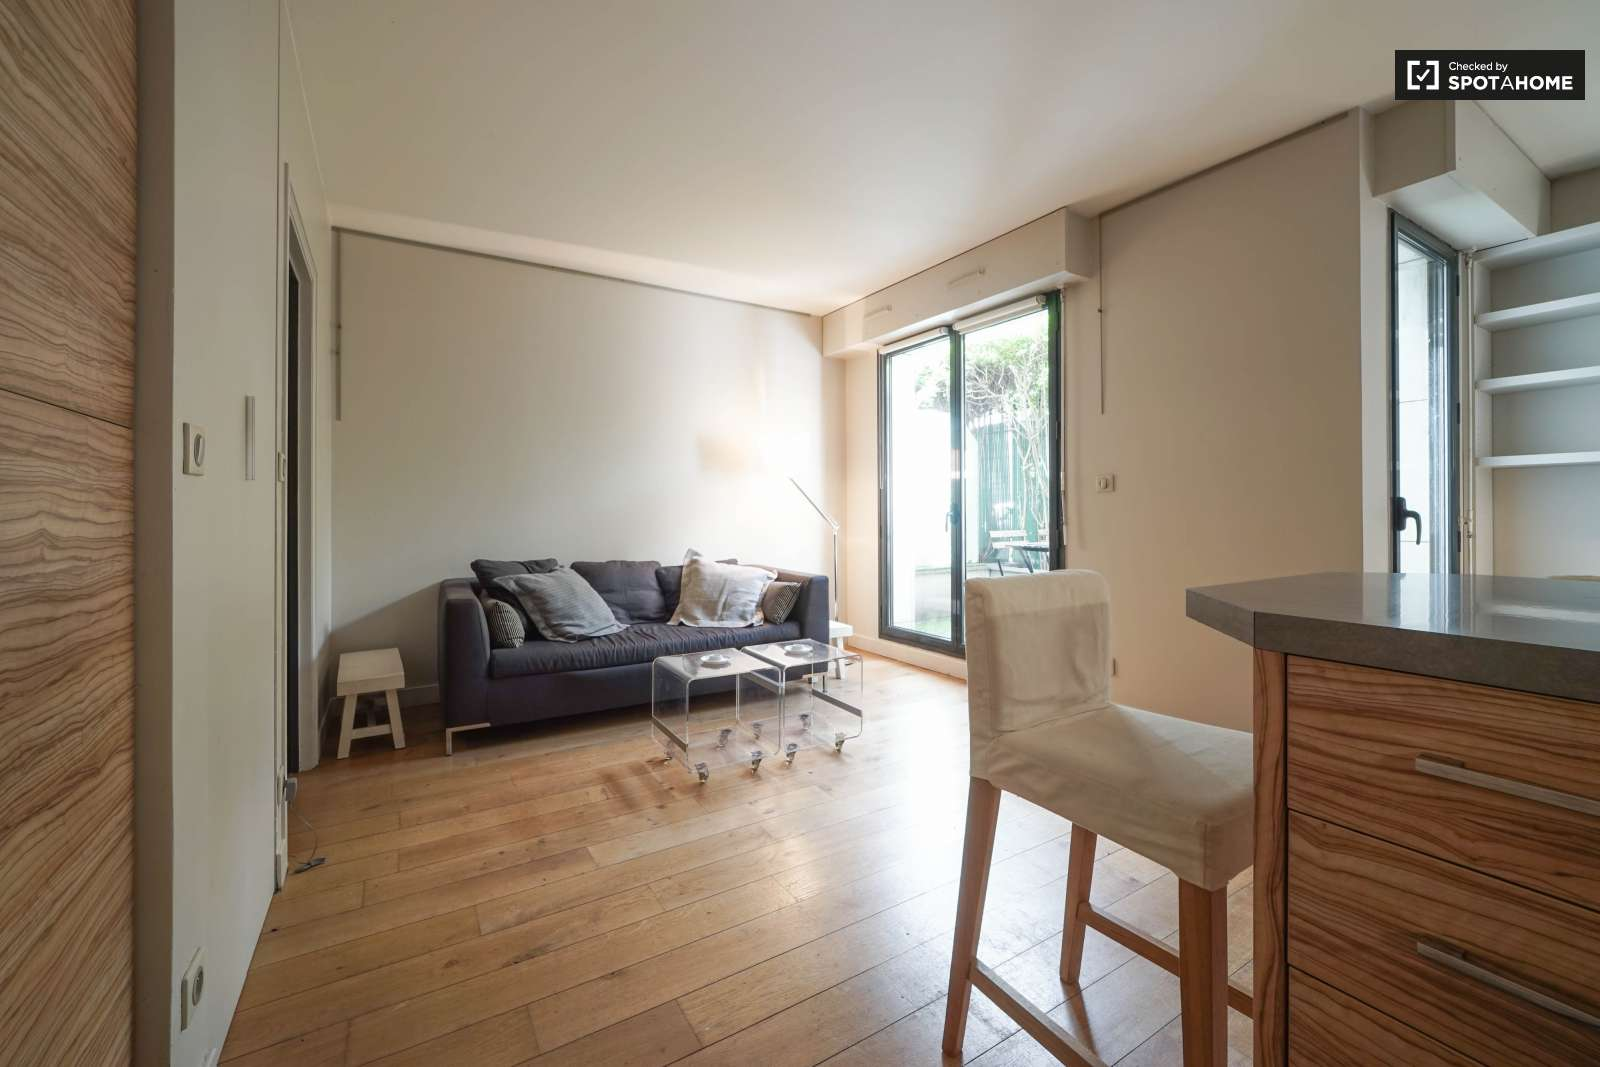 Studio apartment for rent in Boulogne-Billancourt, Paris (ref ...